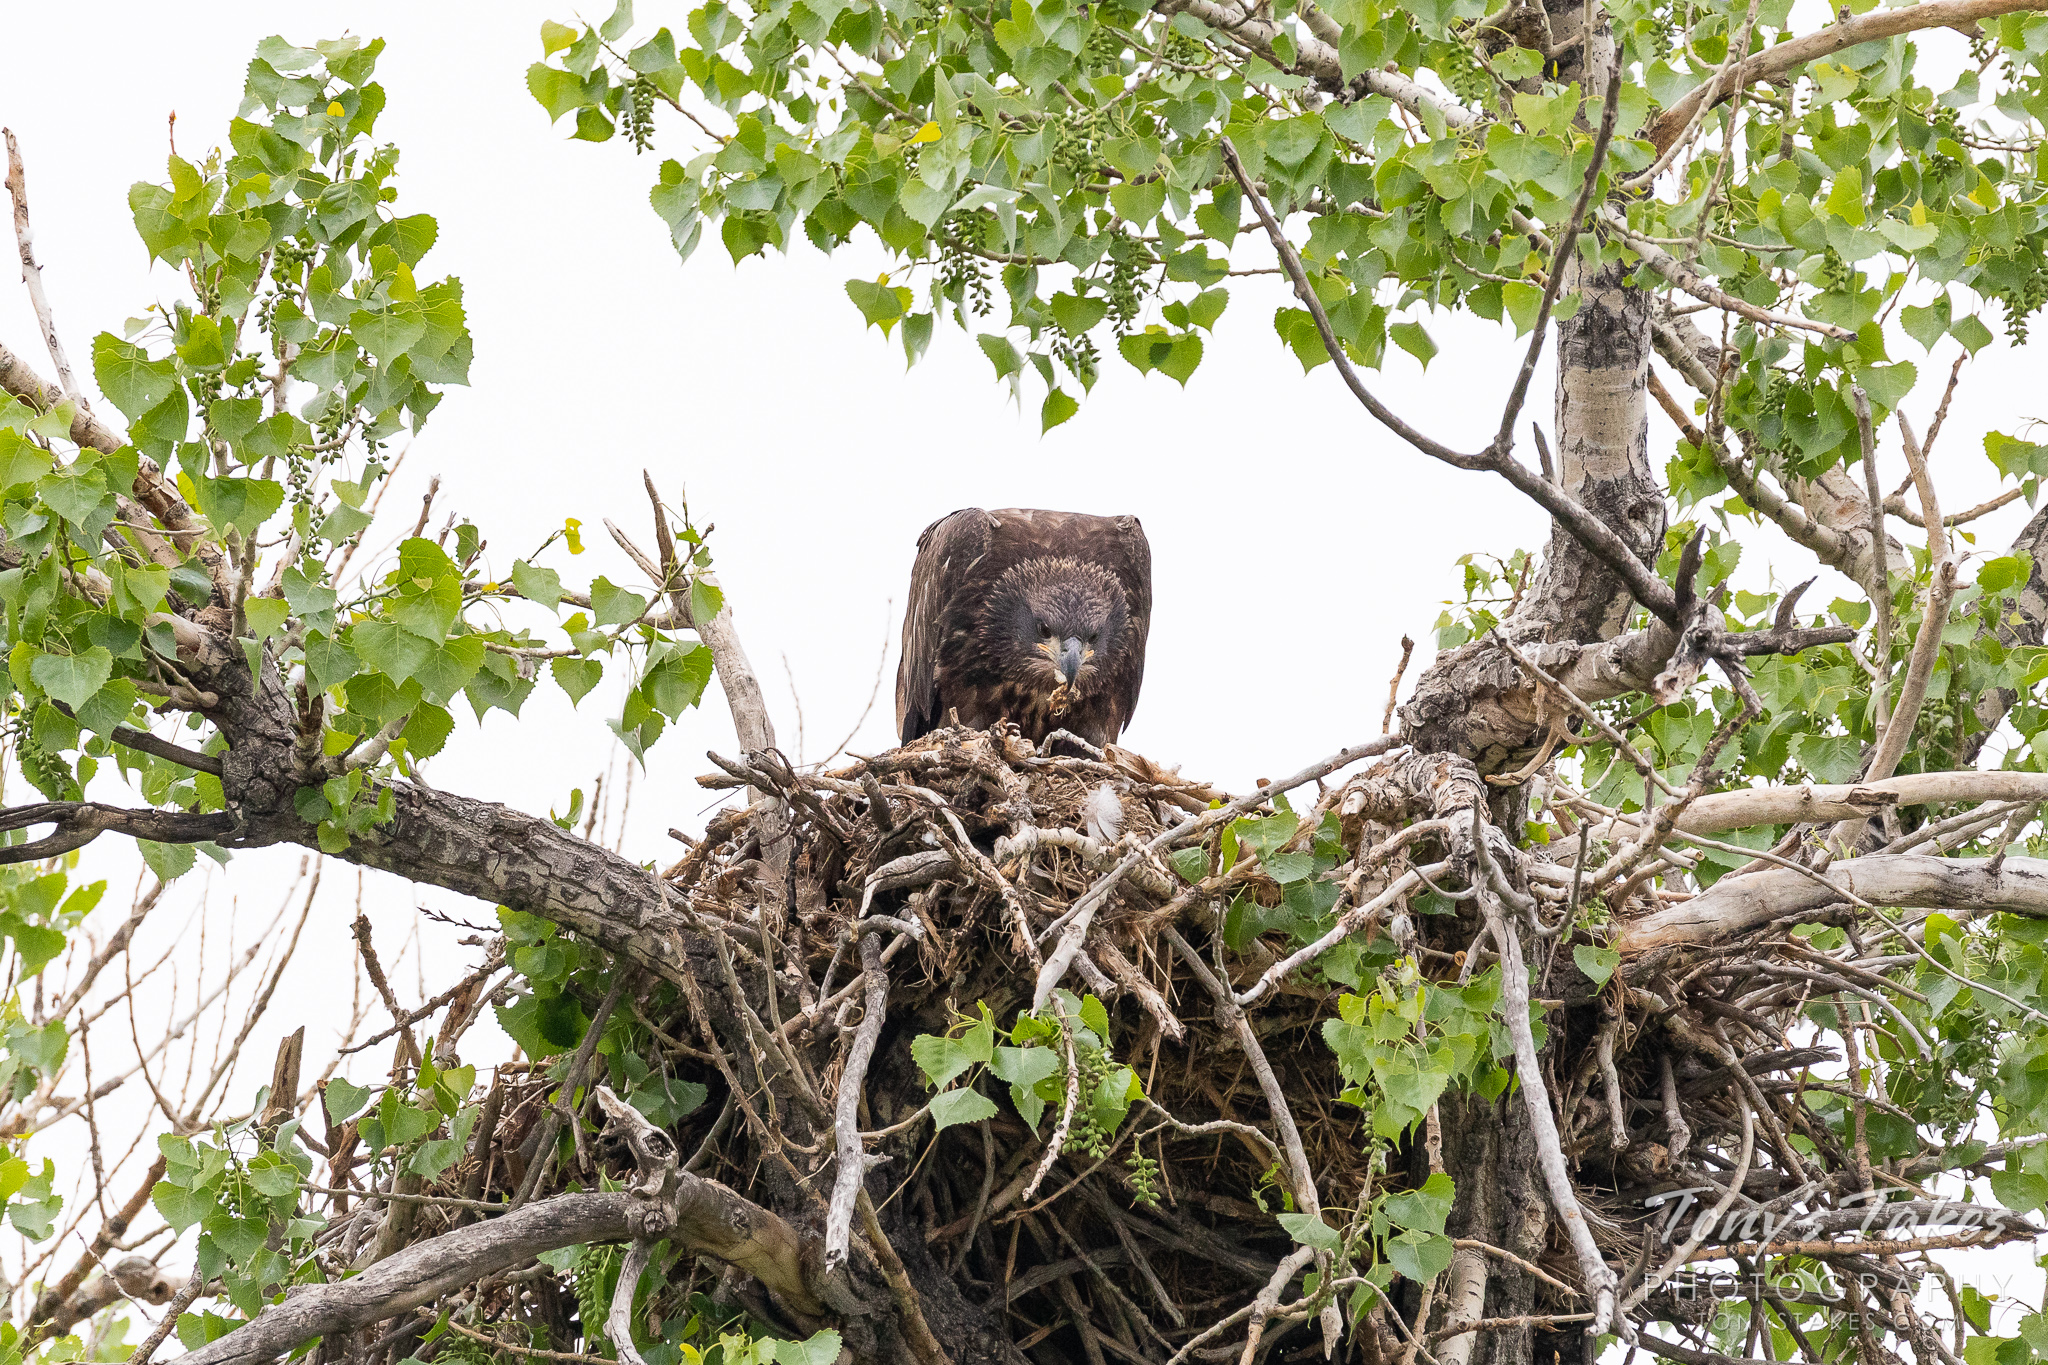 A juvenile bald eagle feeds itself at its nest. (© Tony's Takes)